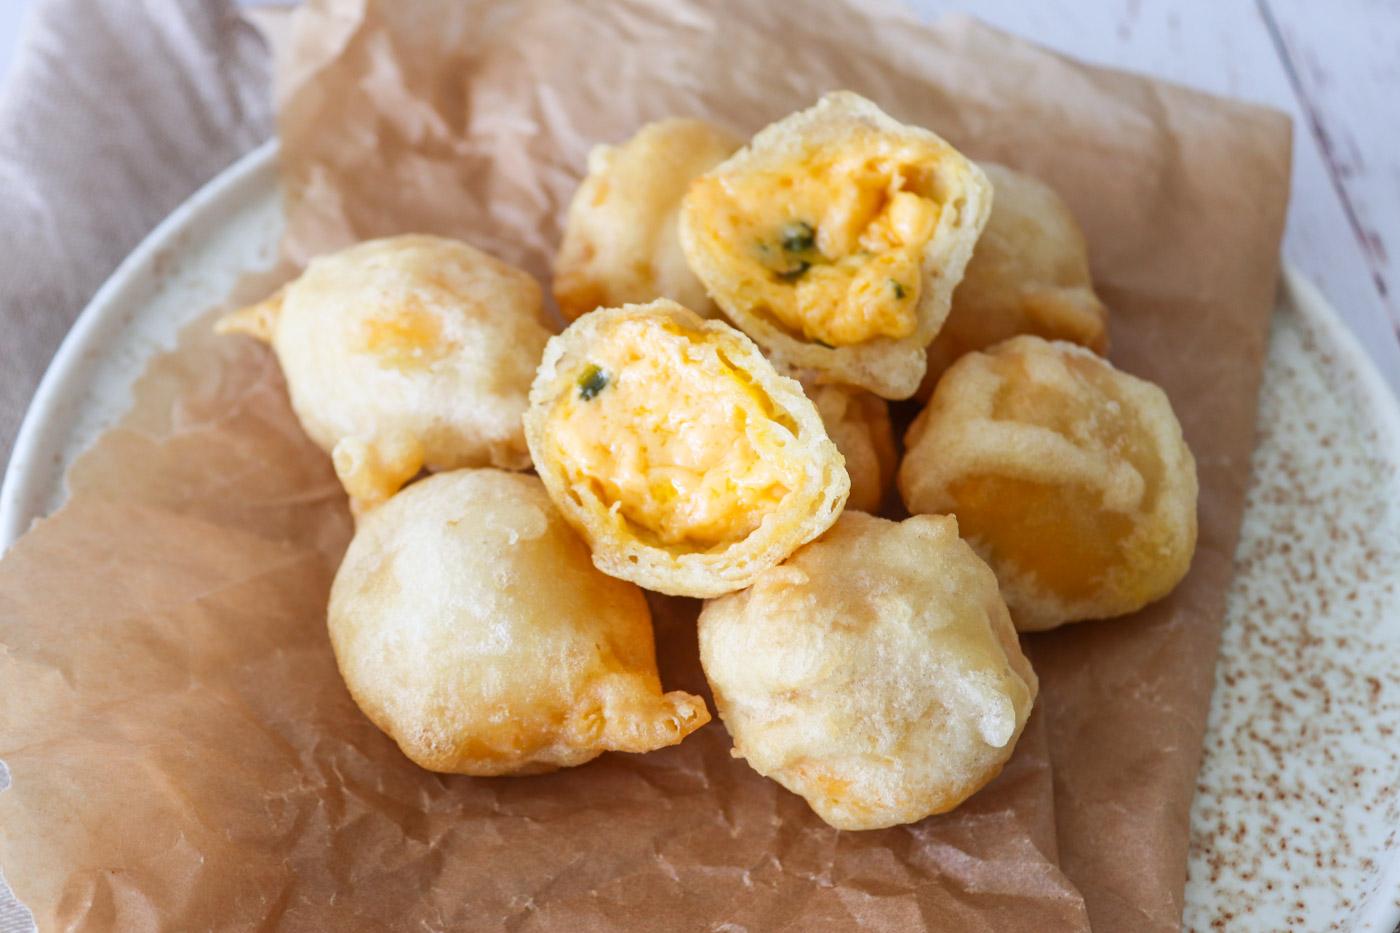 Chili Cheese Tops – Hjemmelavede Ostekugler Med Cheddar